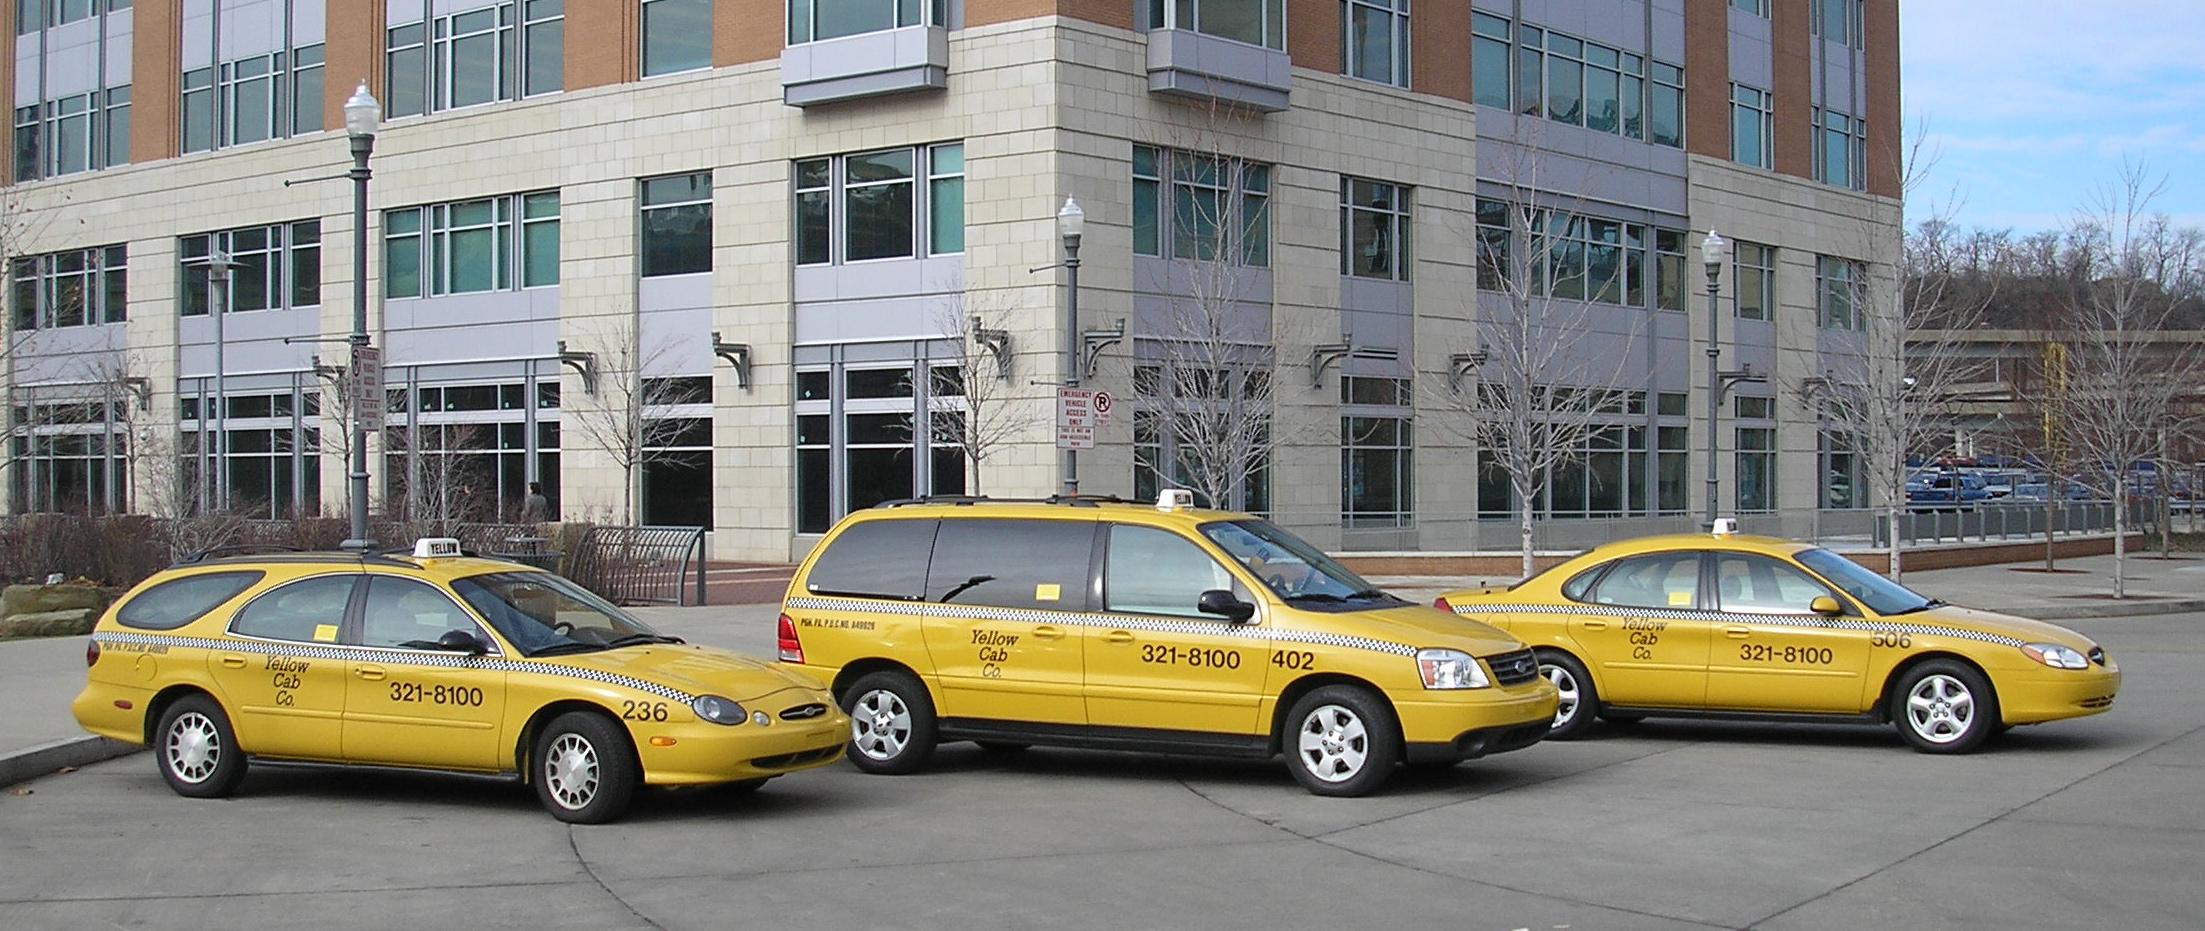 Taxi South Lake Tahoe >> Flat Rate Airport Taxi (SFO) San Francisco, (SJC) San Jose